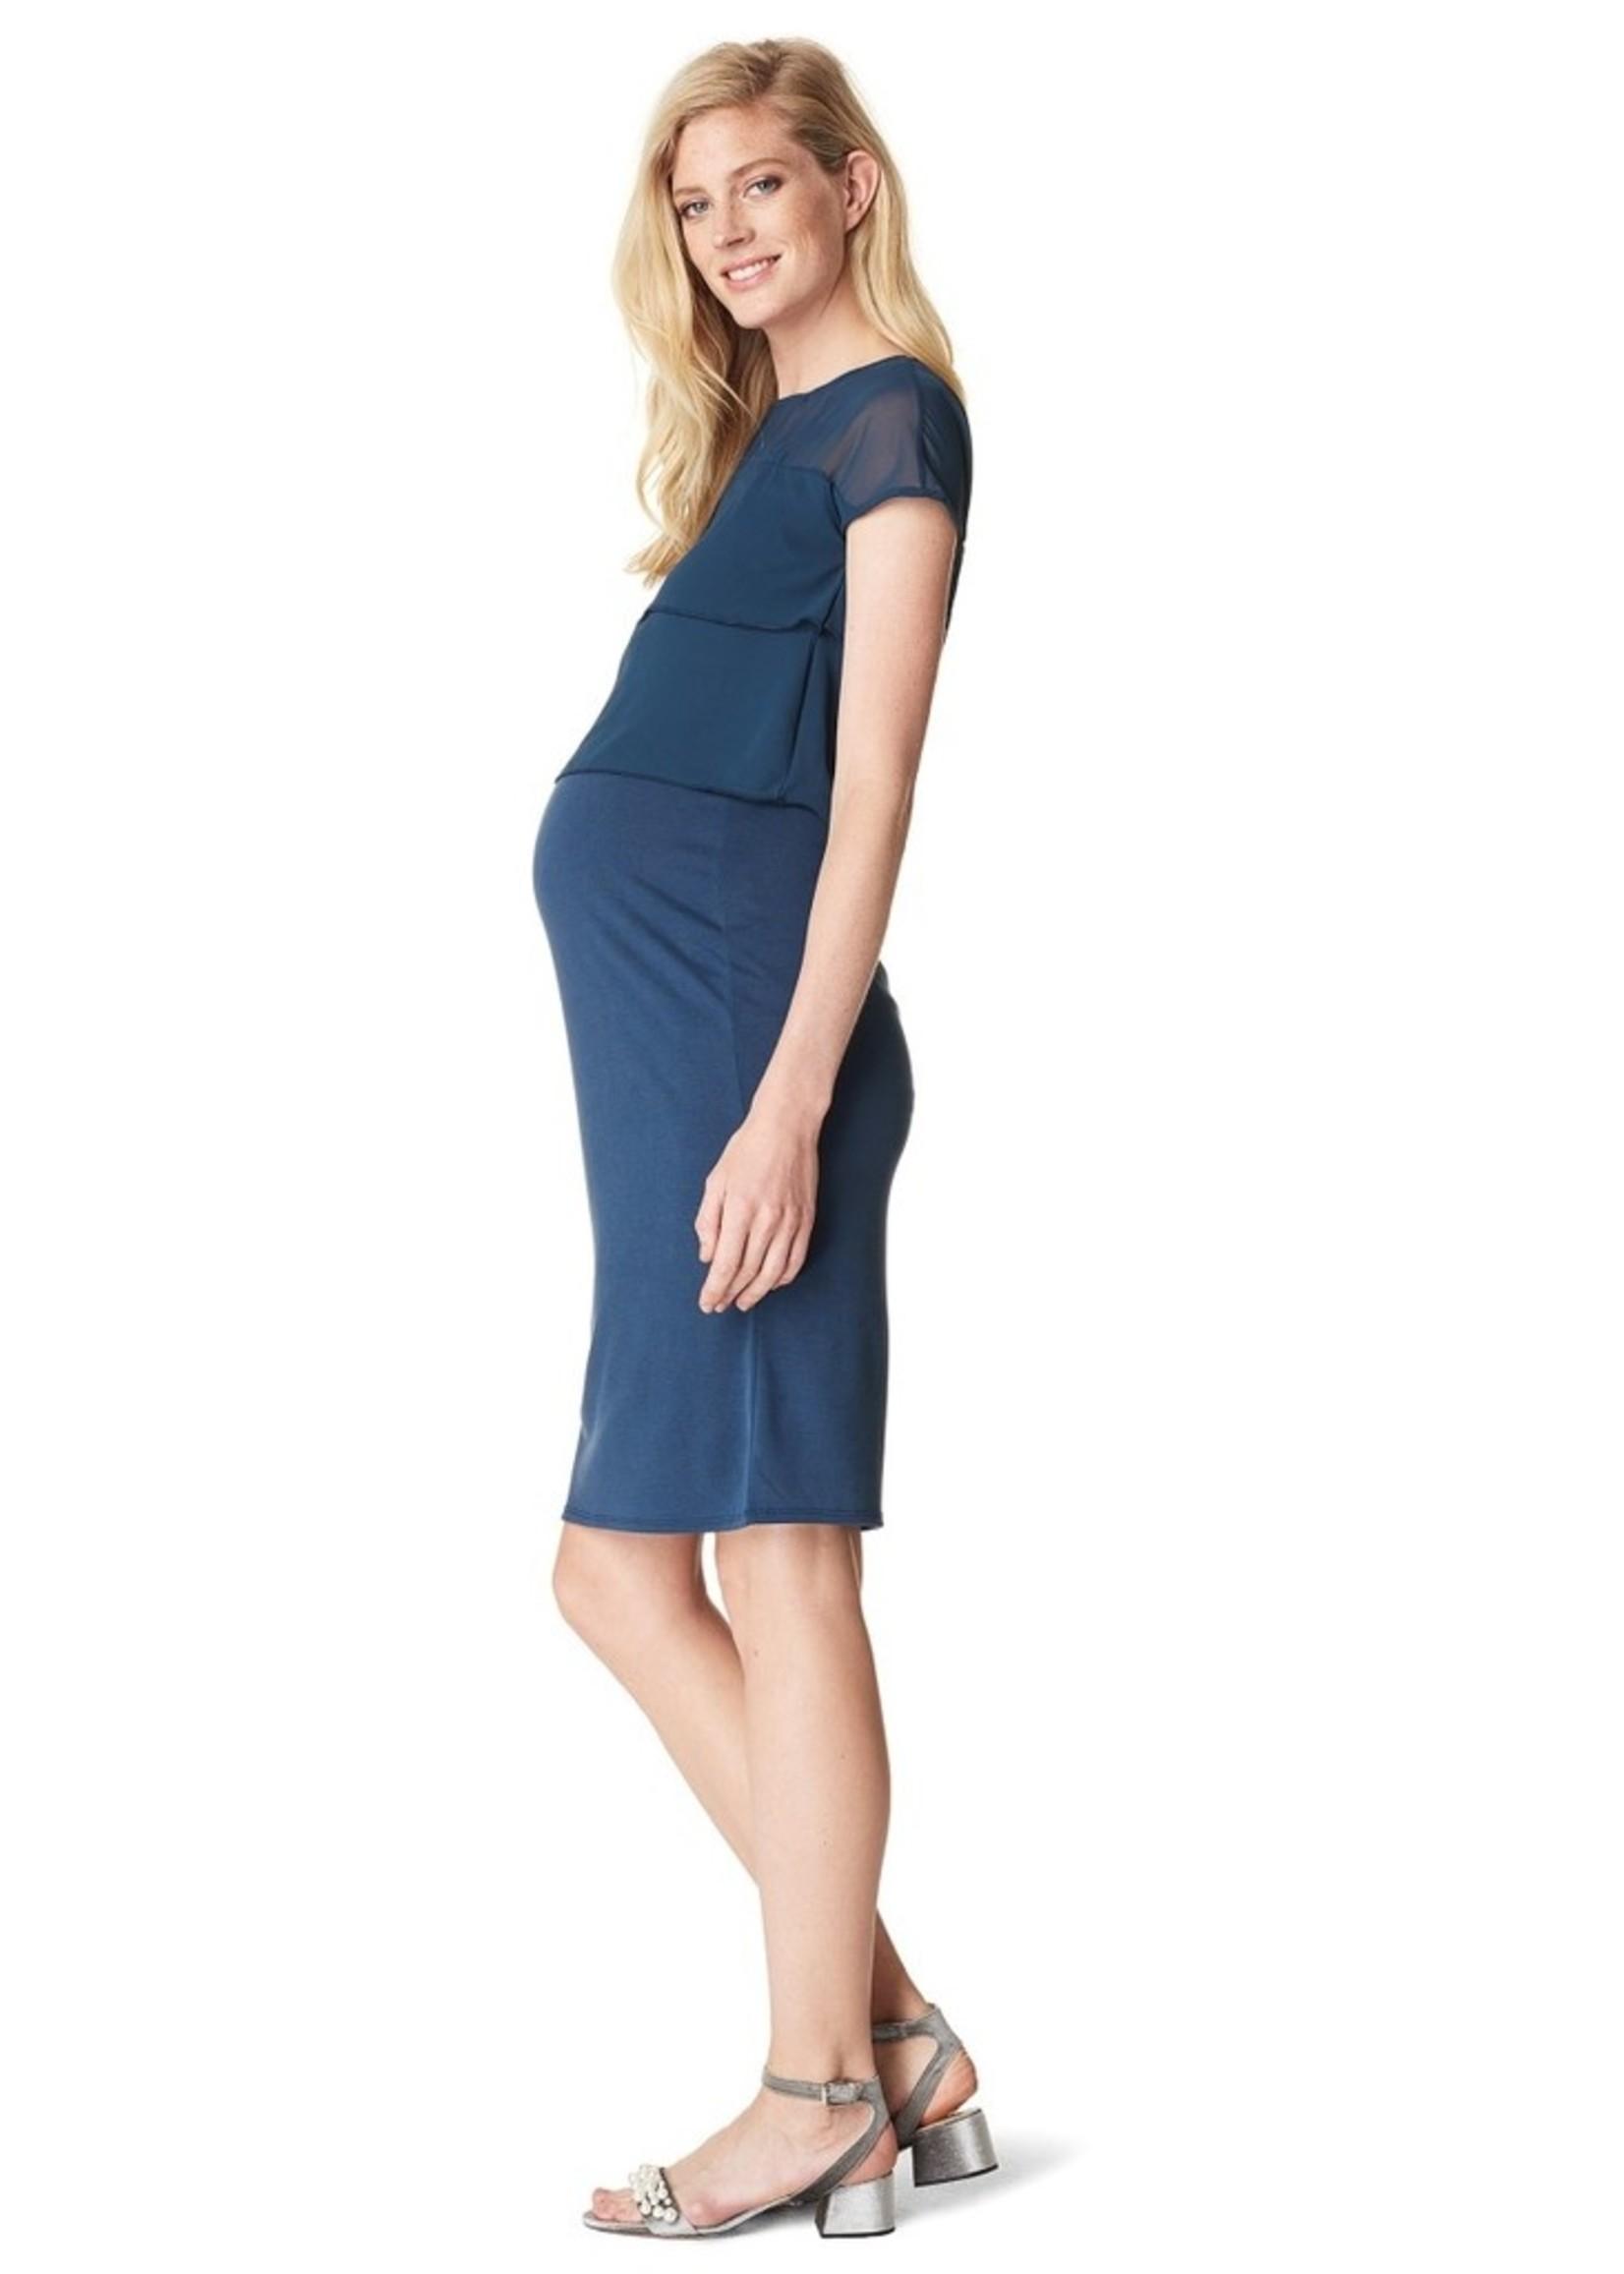 Noppies Maternity Noppies Maternity, Daisy Maternity and Nursing Dress